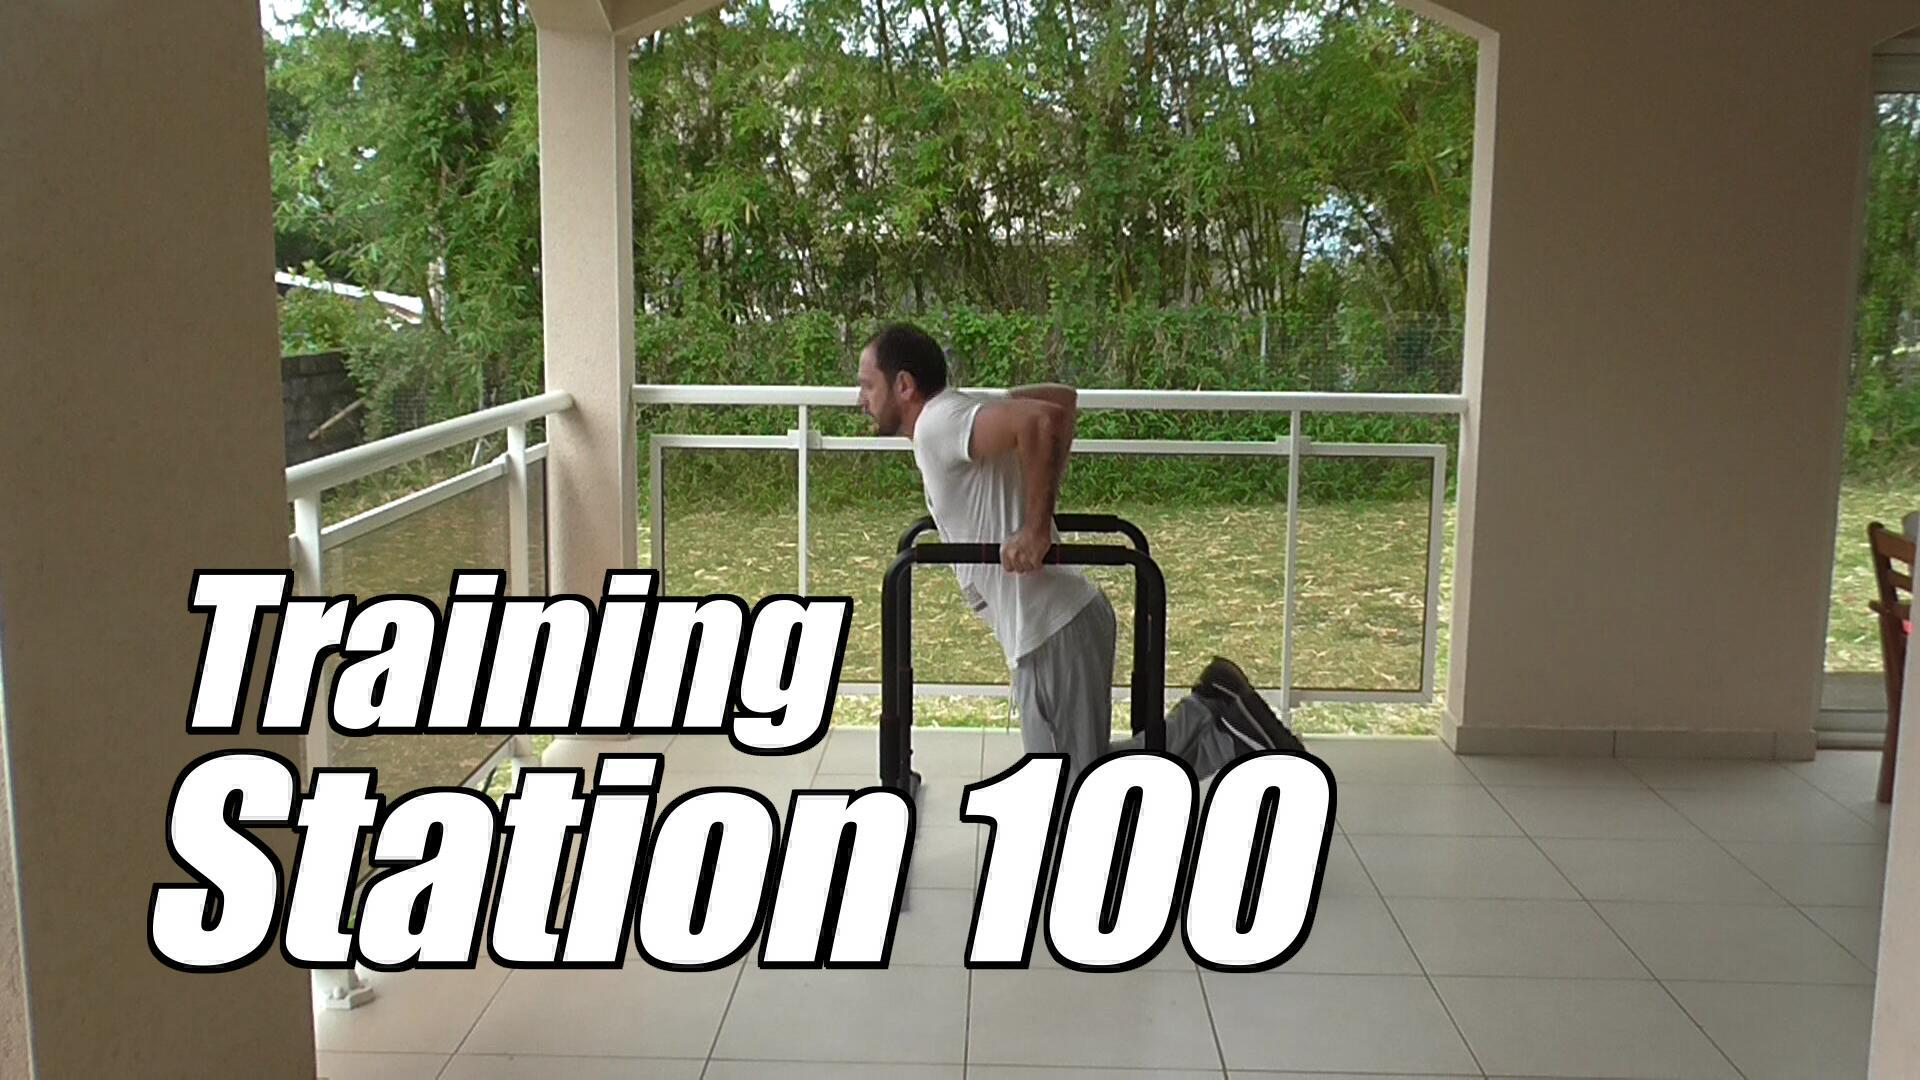 Training Station 100 Domyos